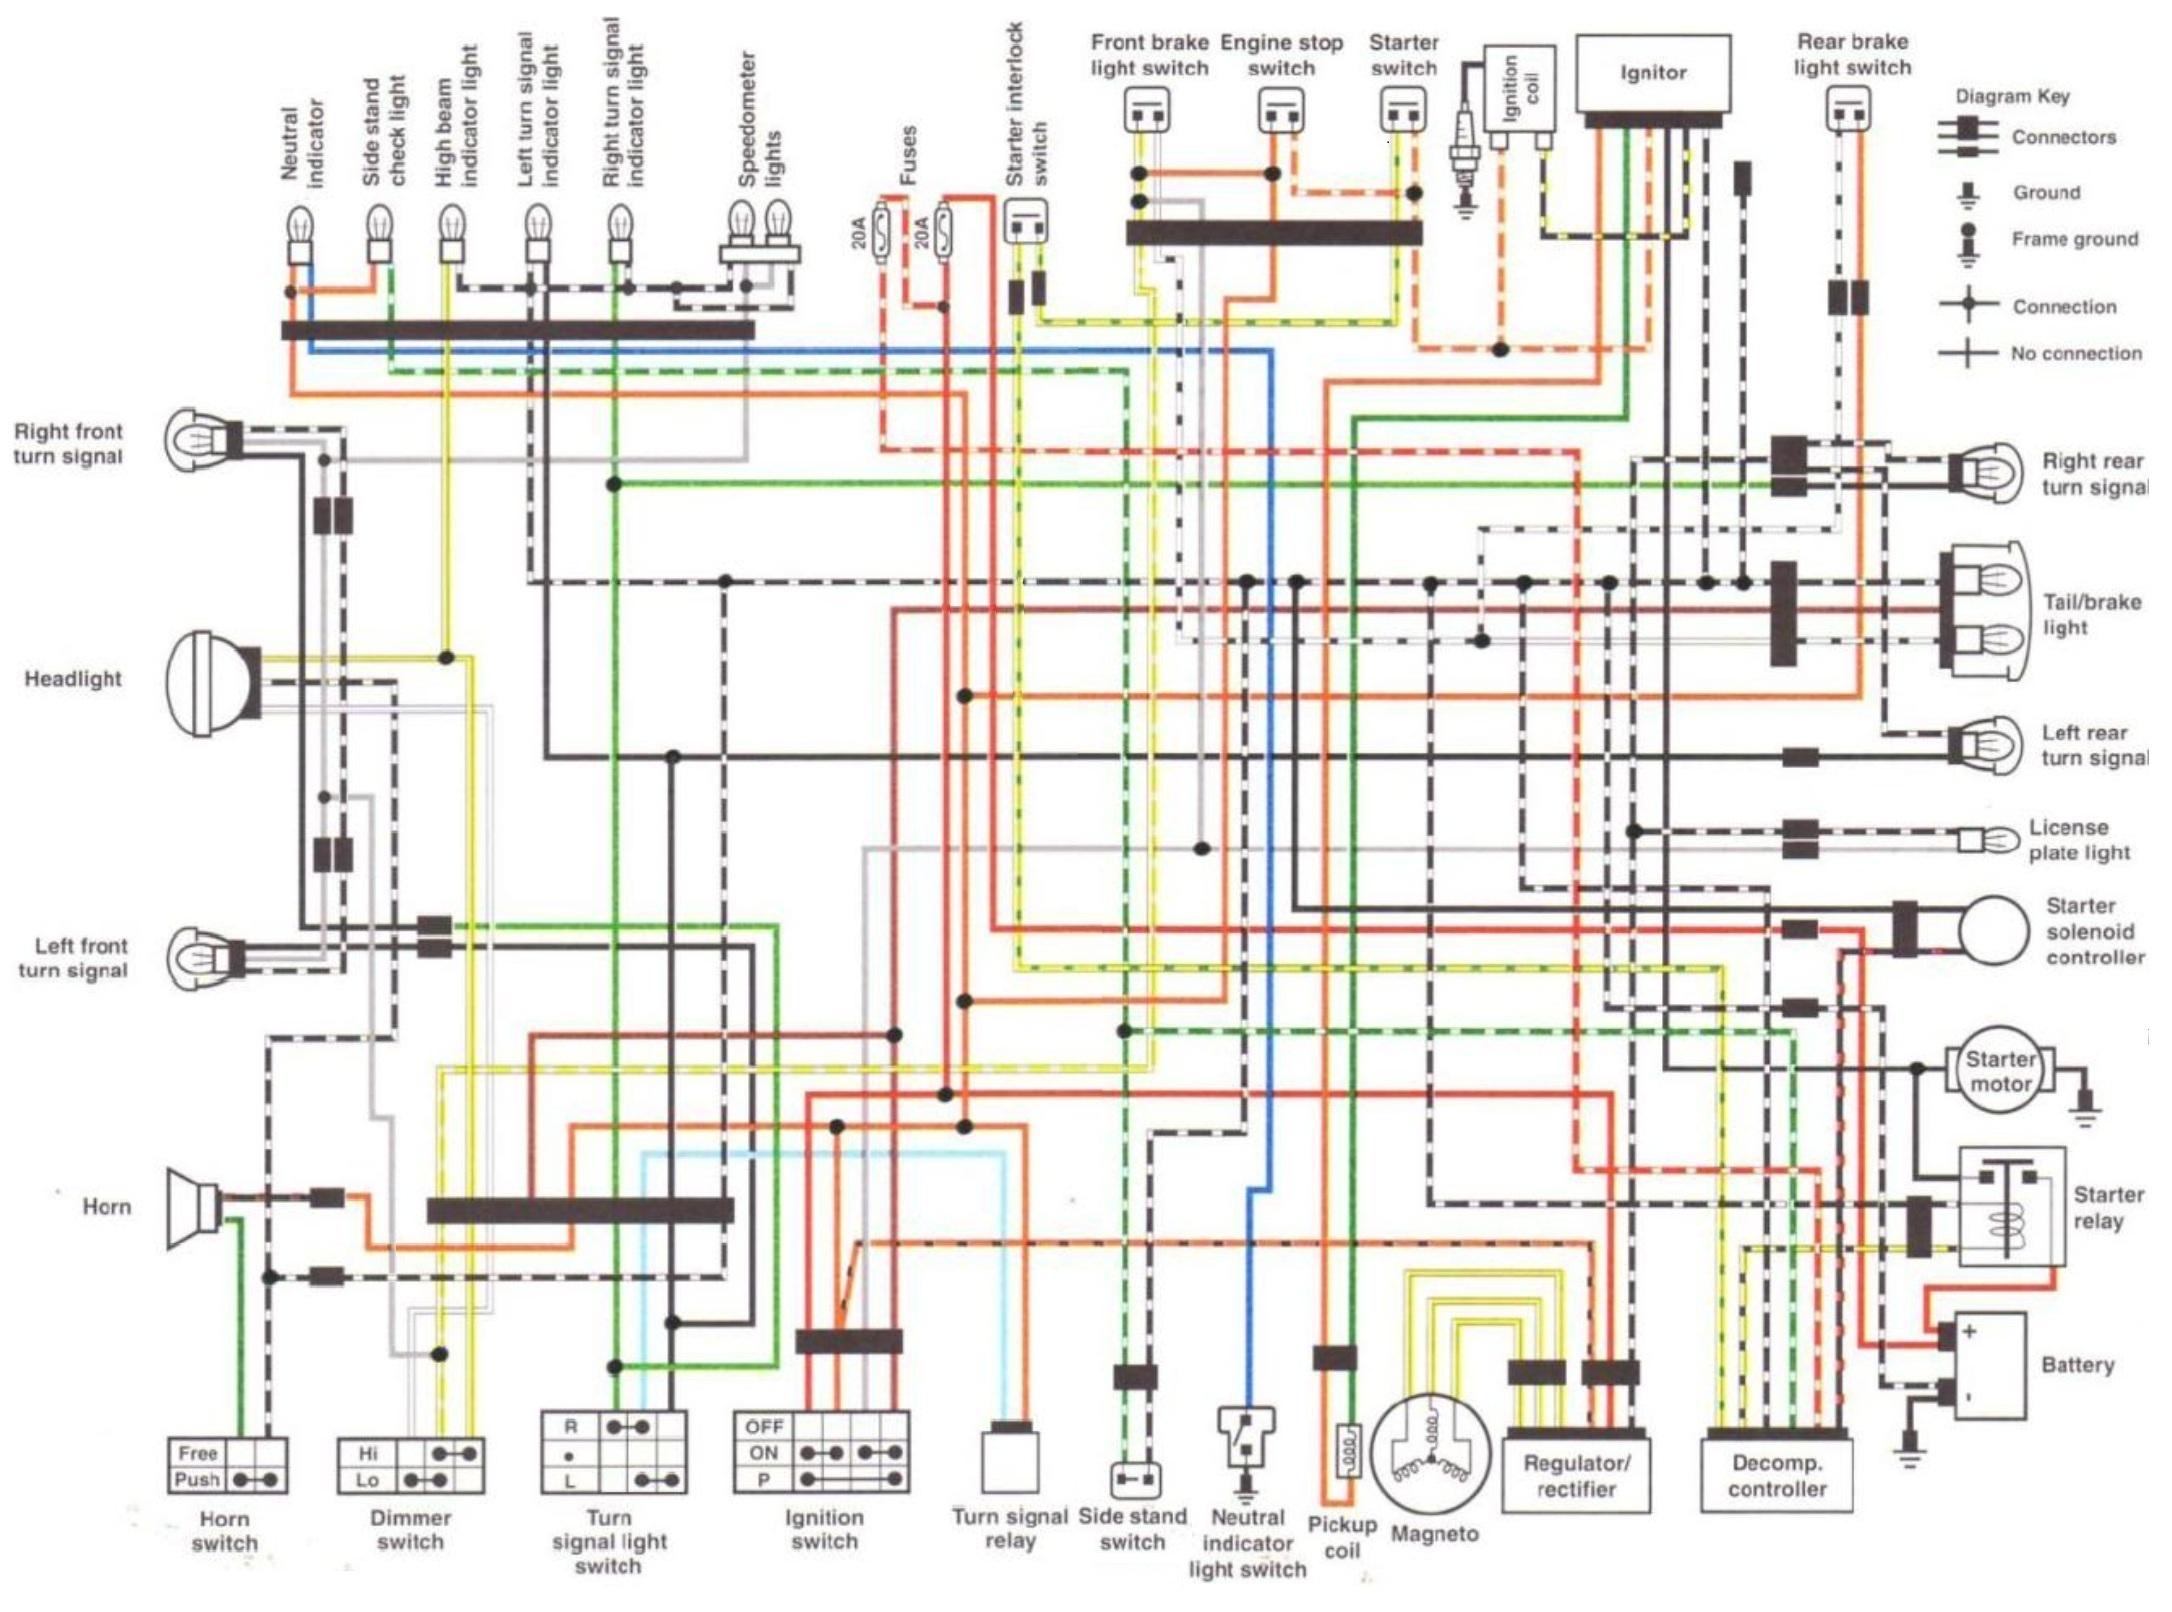 [WRG-7045] Suzuki Savage Wiring Diagram Free